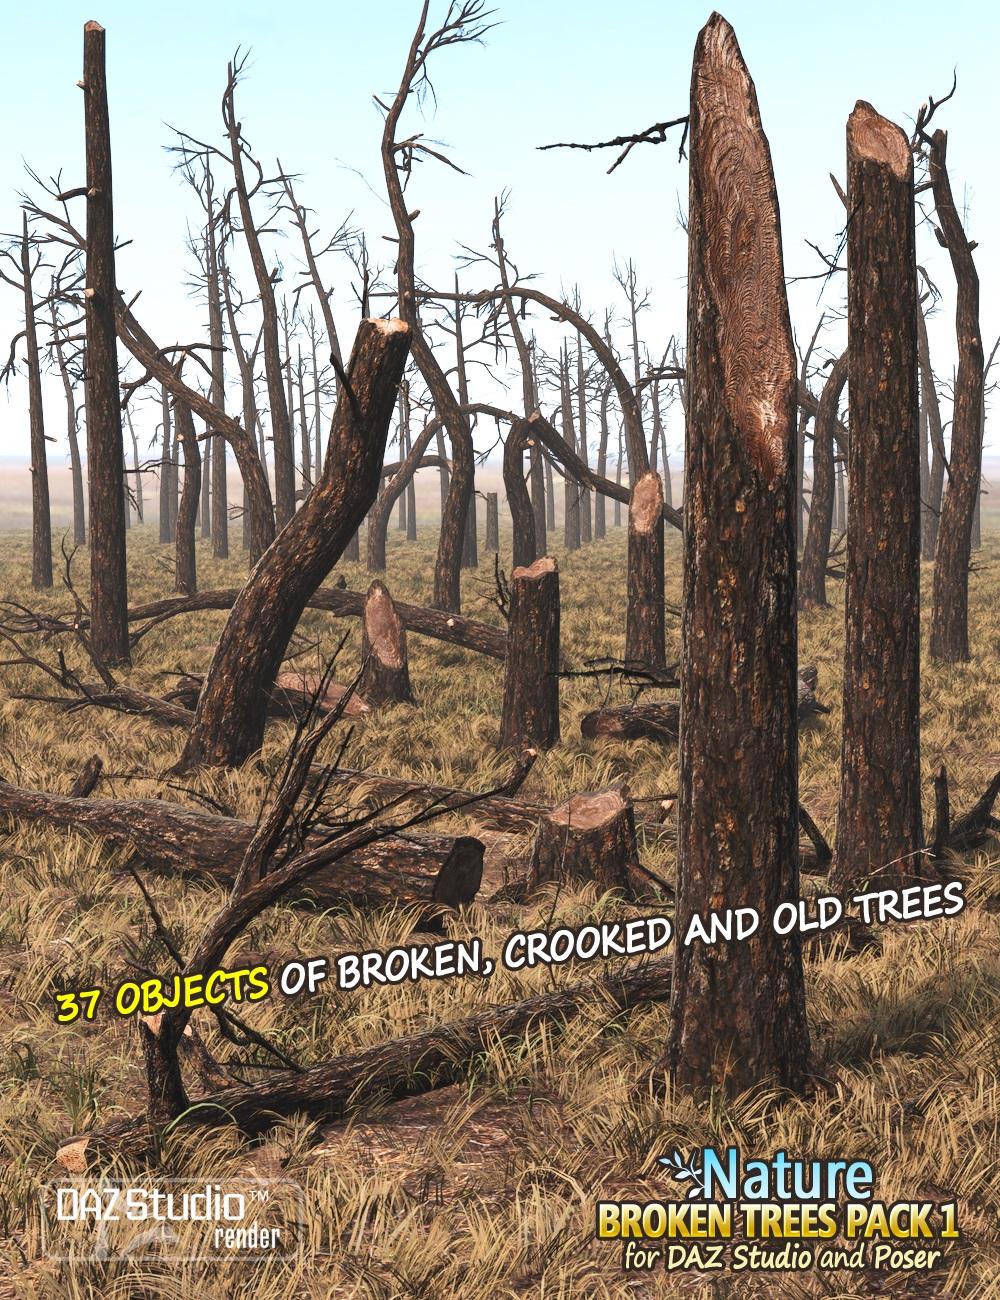 Nature - Broken Trees Pack 1 by: Andrey Pestryakov, 3D Models by Daz 3D